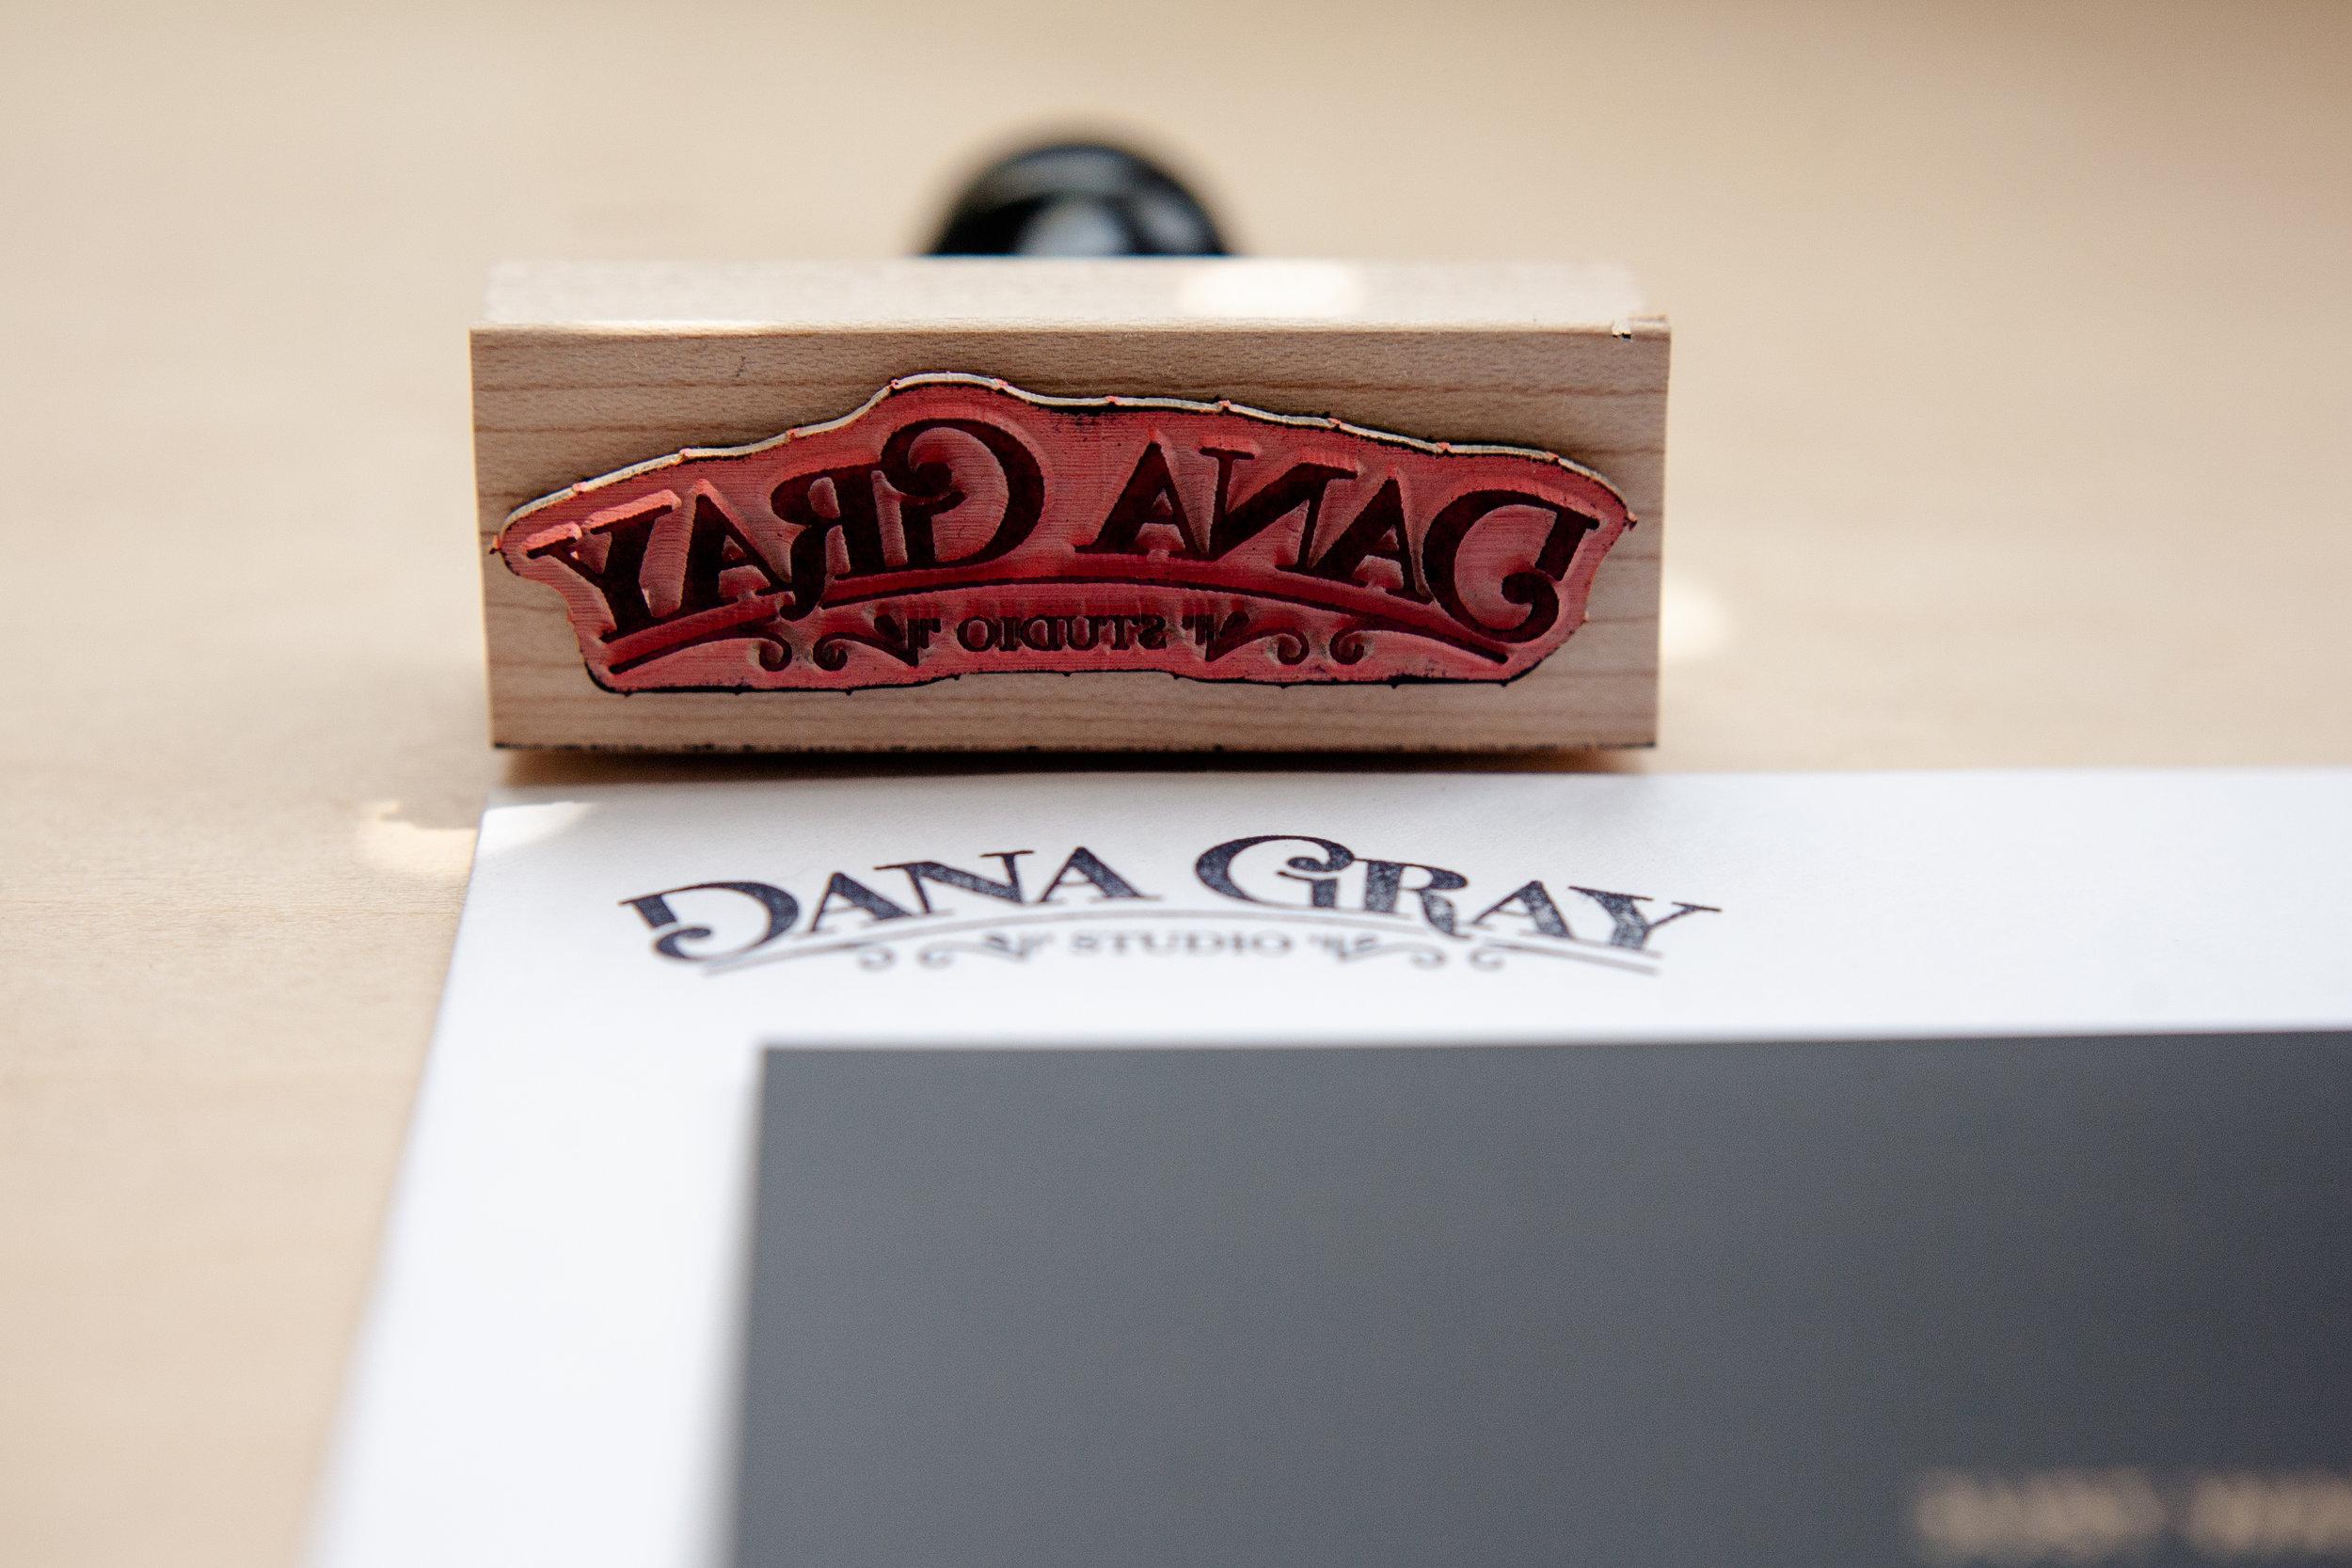 dana_gray_studio_stationery-5.jpg